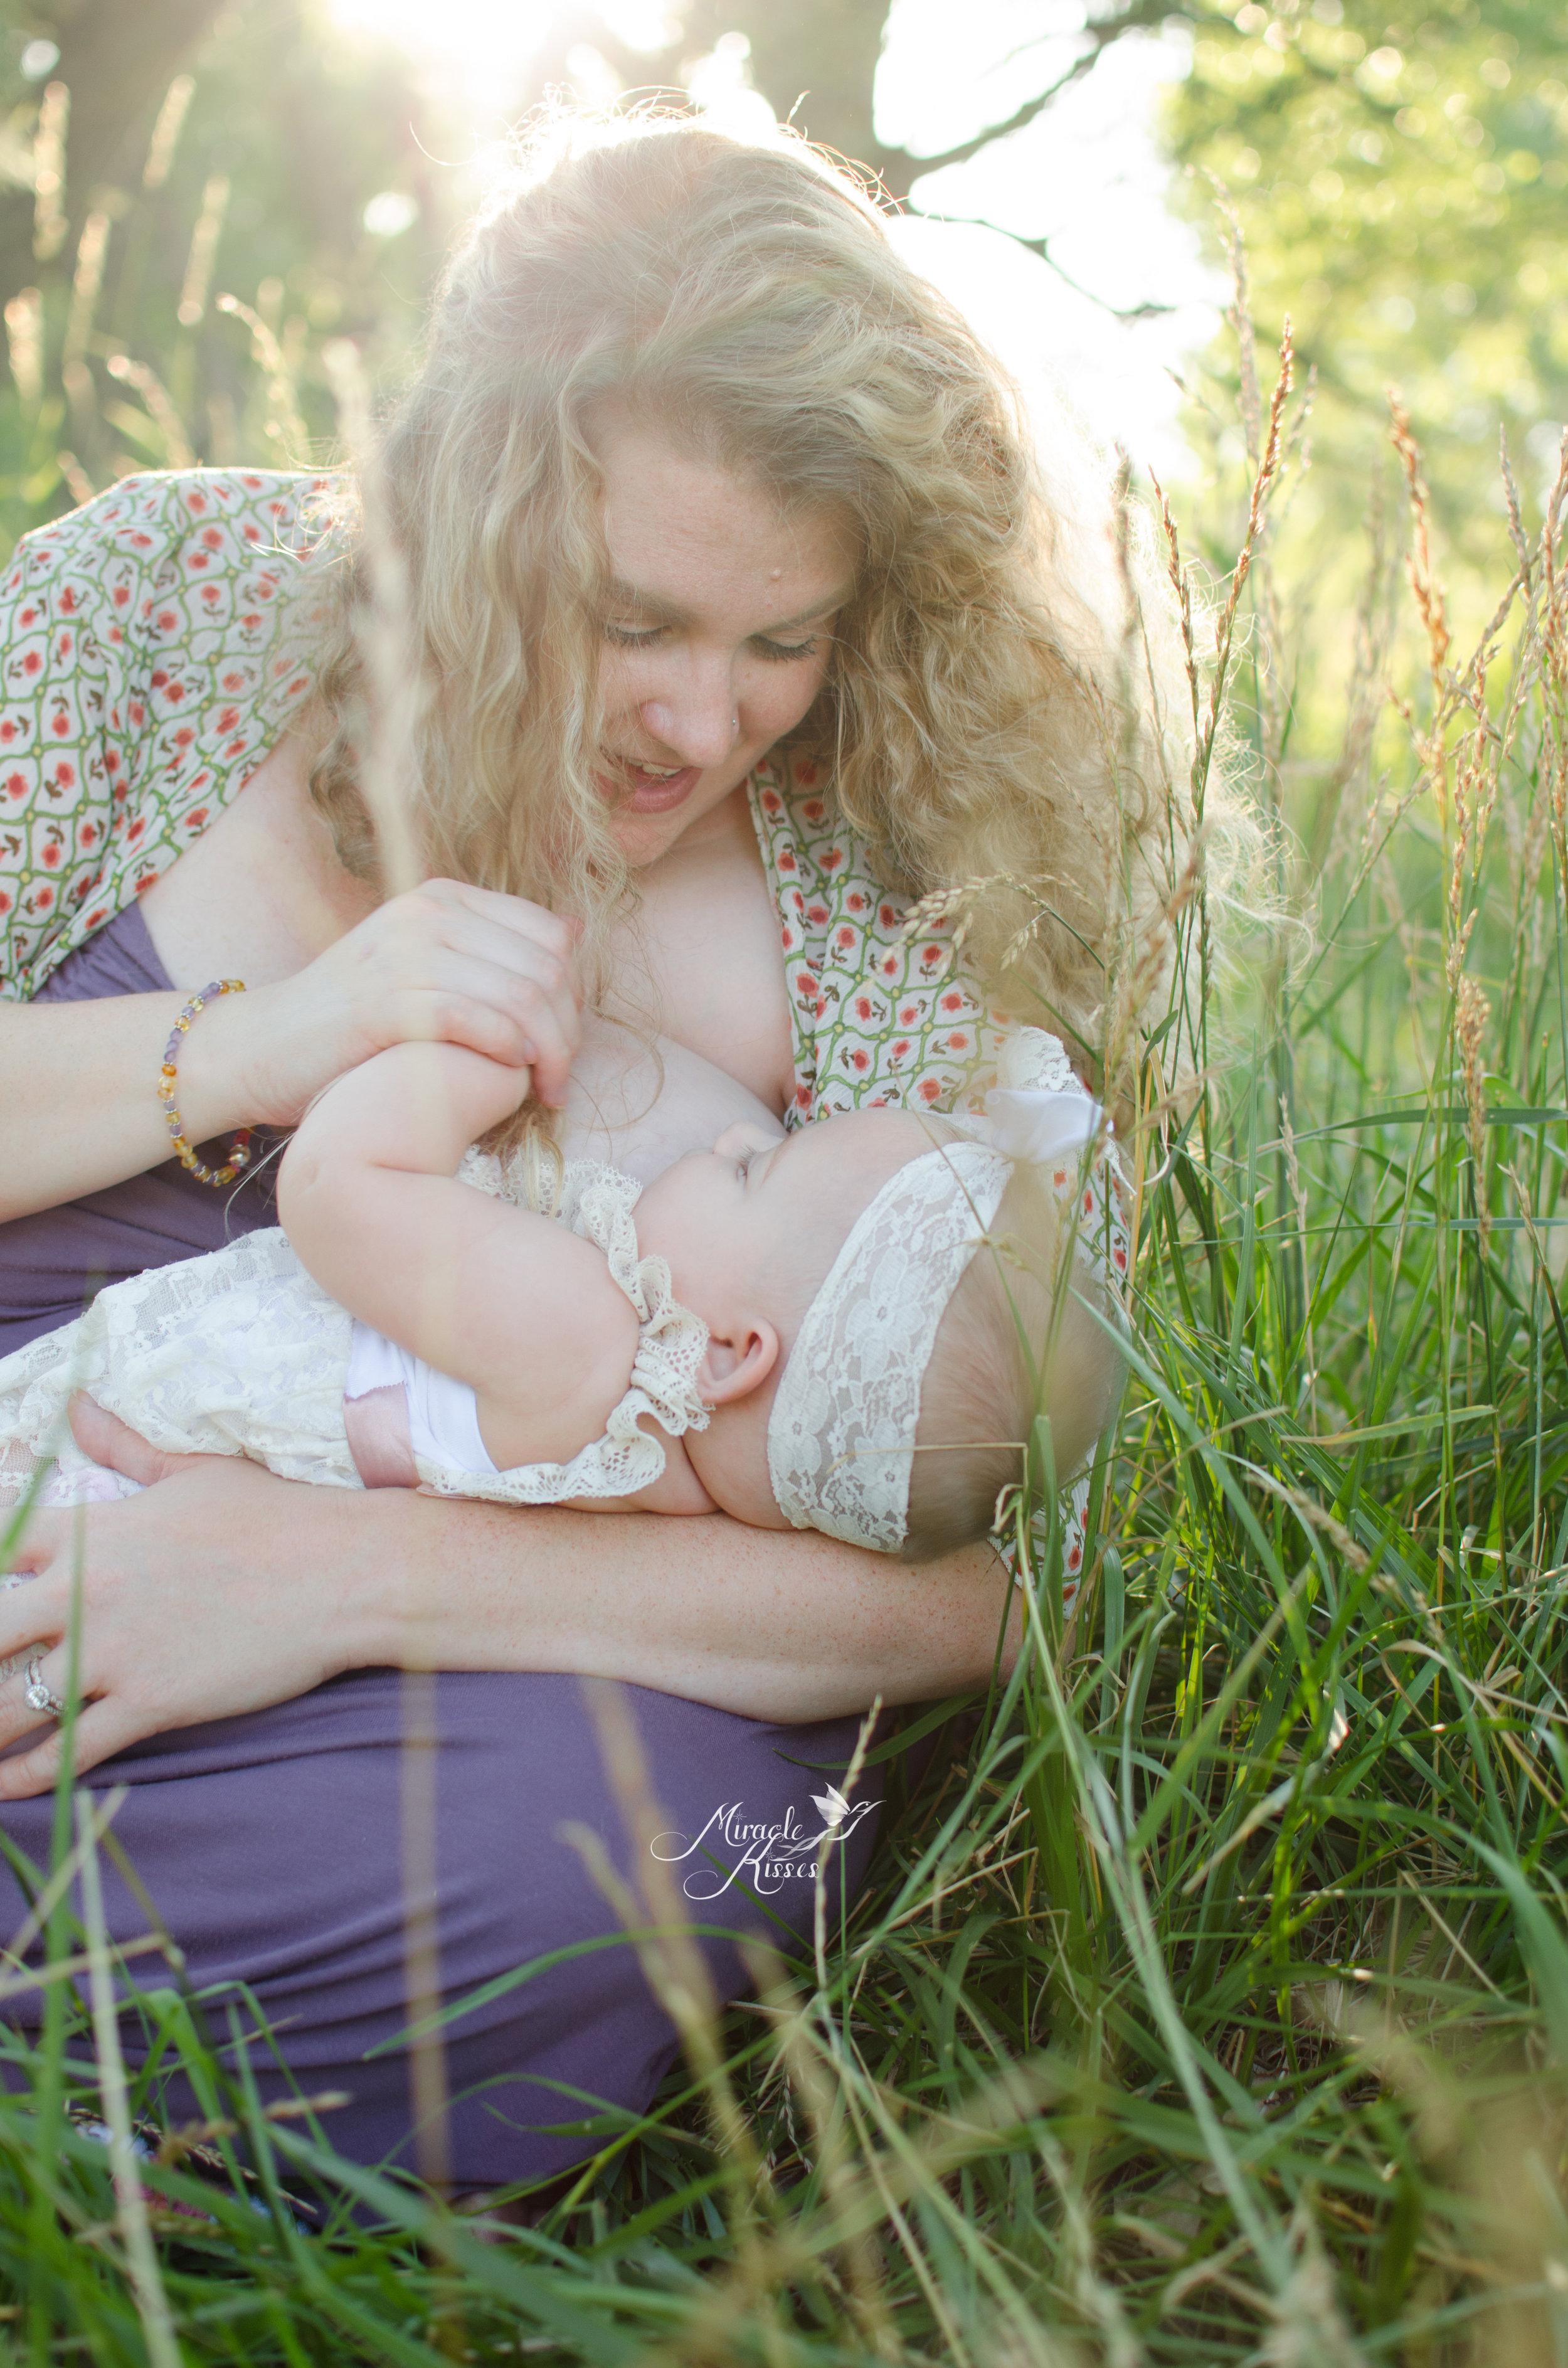 Breastfeeding in the grass, beautiful light, 31 days 31 stories